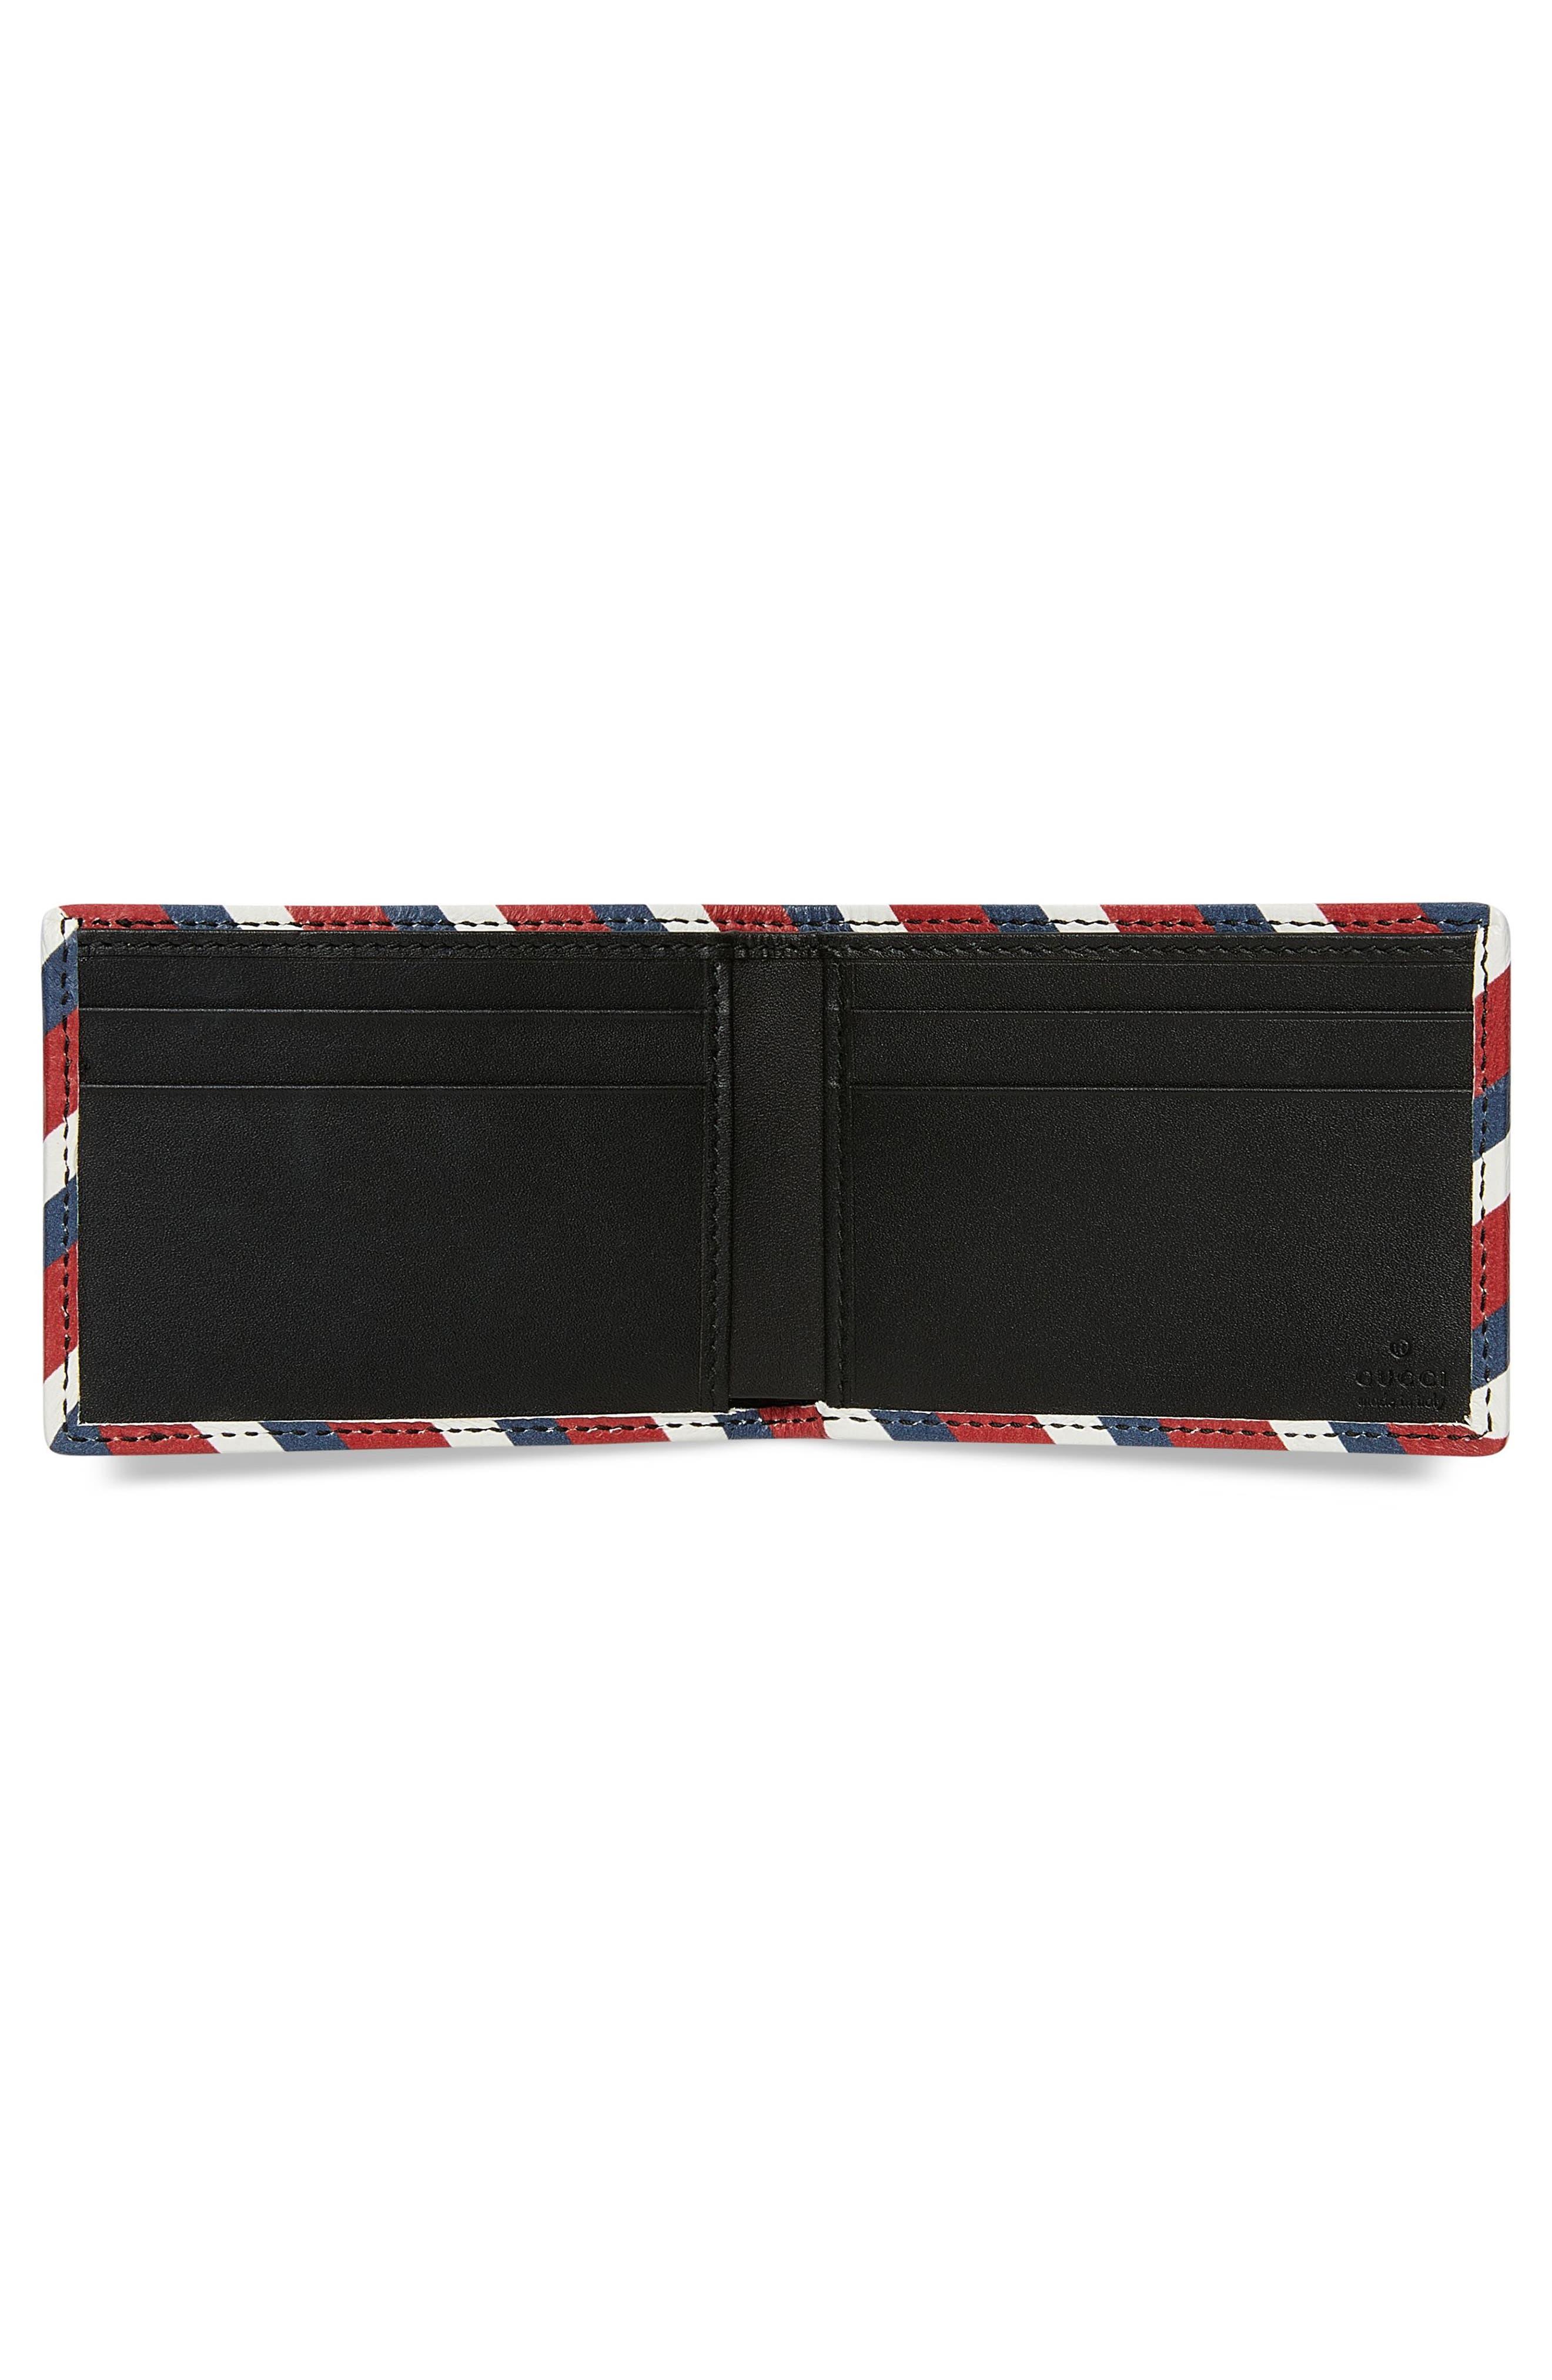 GG Supreme Patch Wallet,                             Alternate thumbnail 2, color,                             BLACK